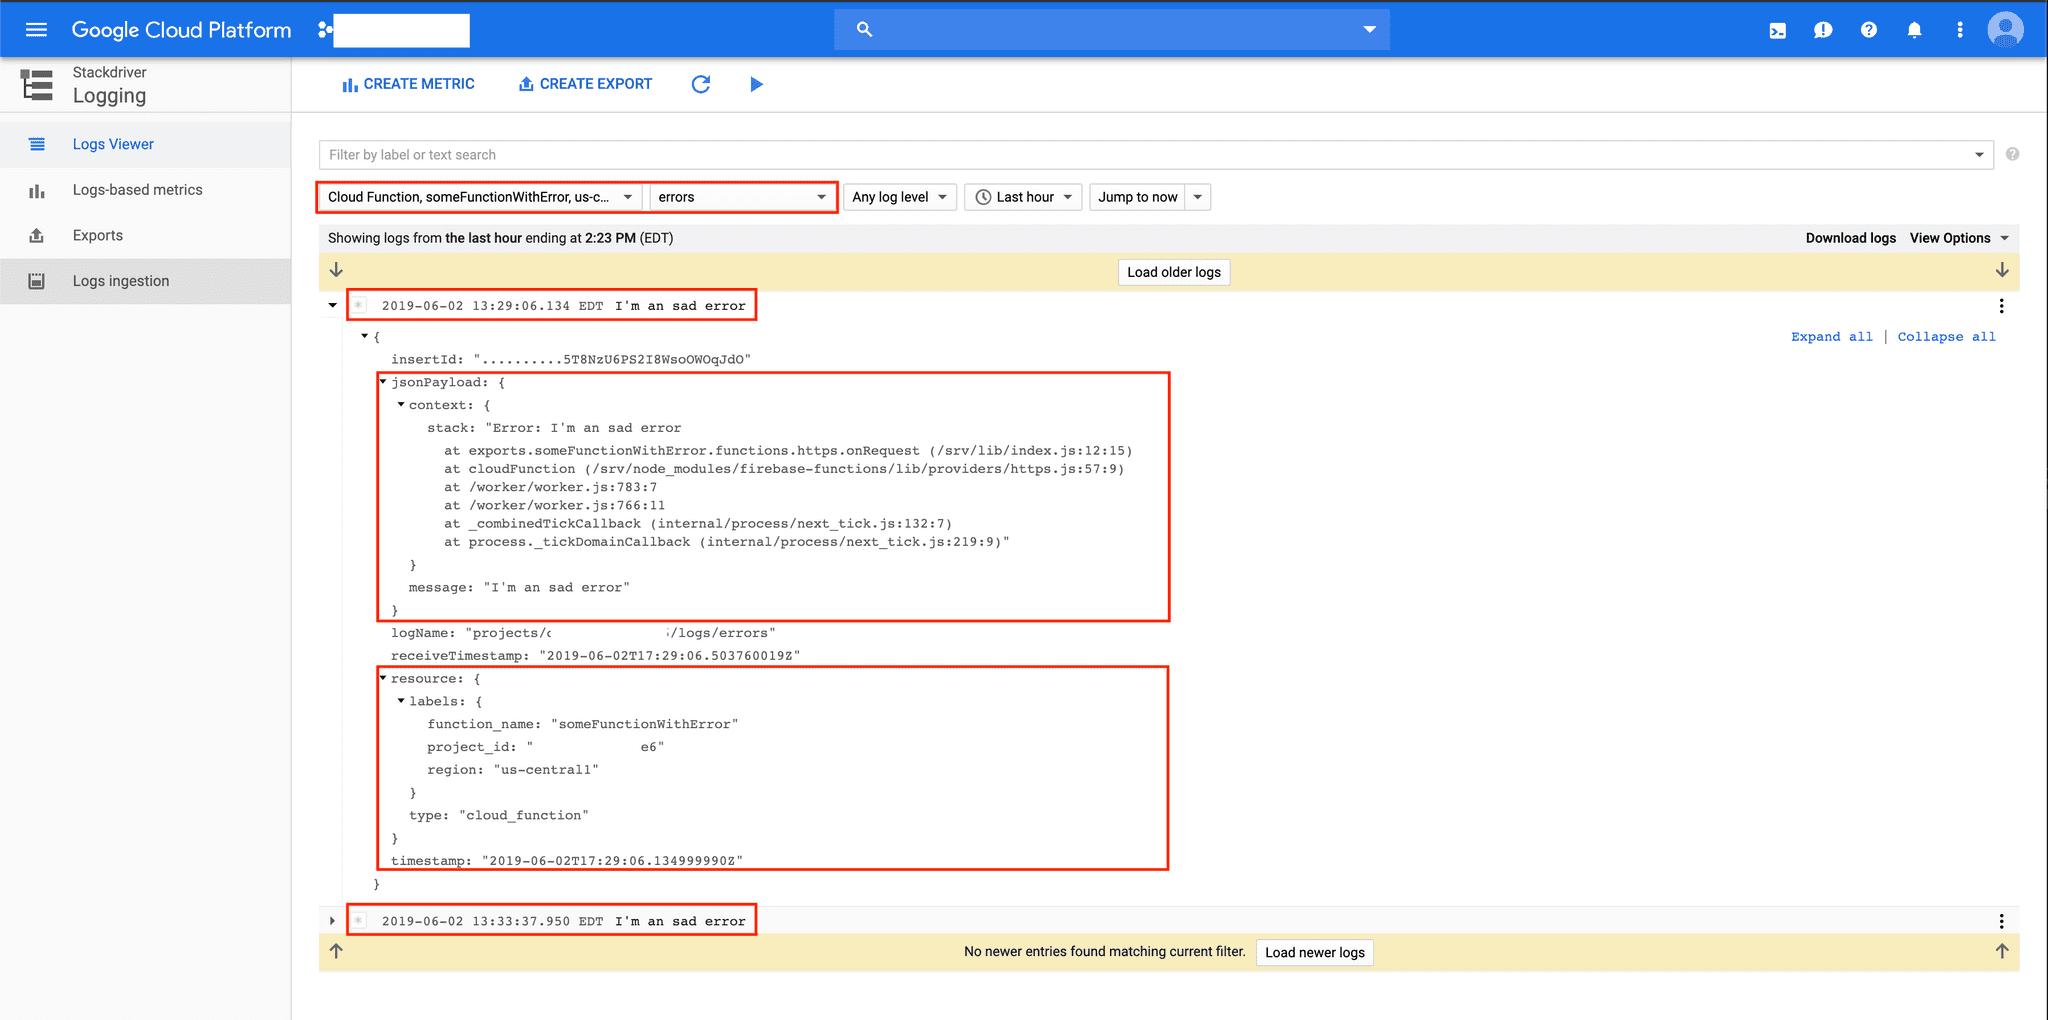 gcp-console.logs